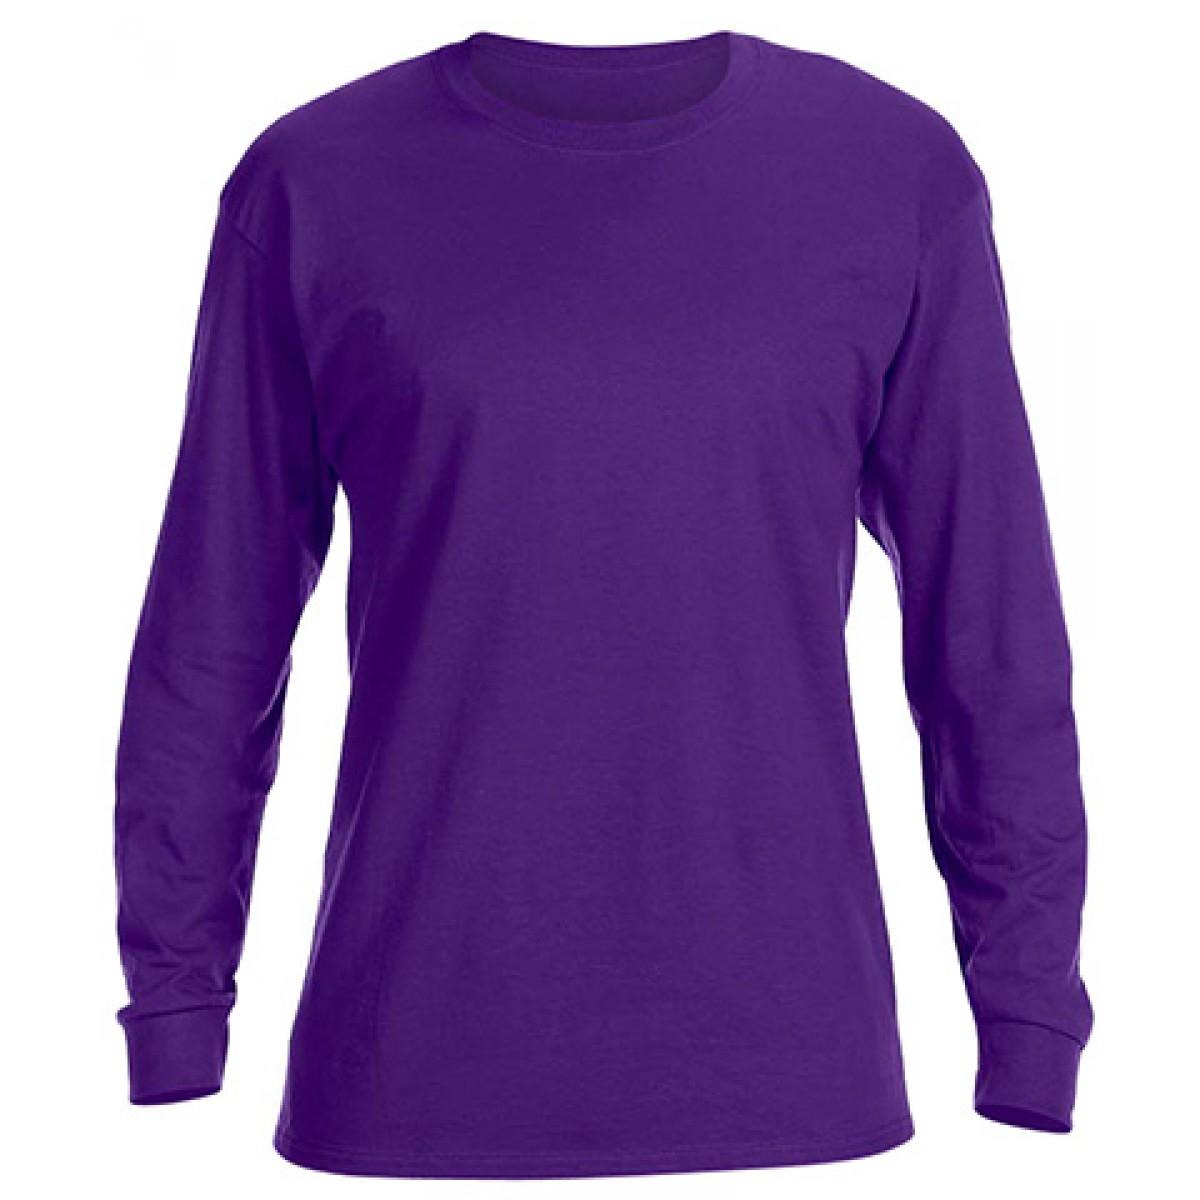 Basic Long Sleeve Crew Neck -Purple-YS